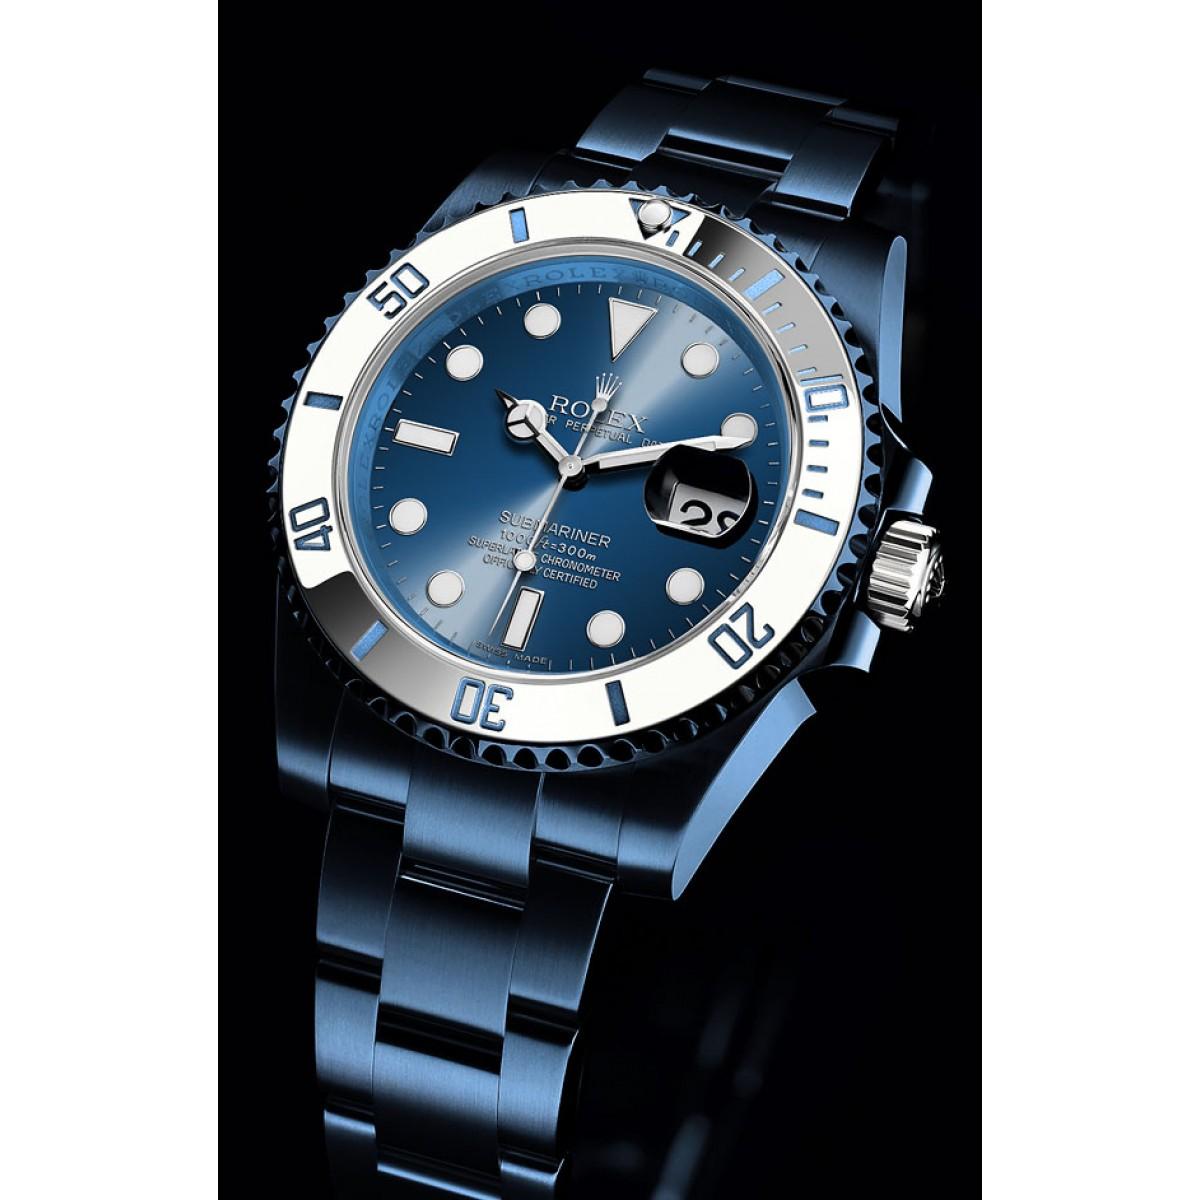 5c1dcdb5388 Relógio Réplica Rolex Submariner Blue